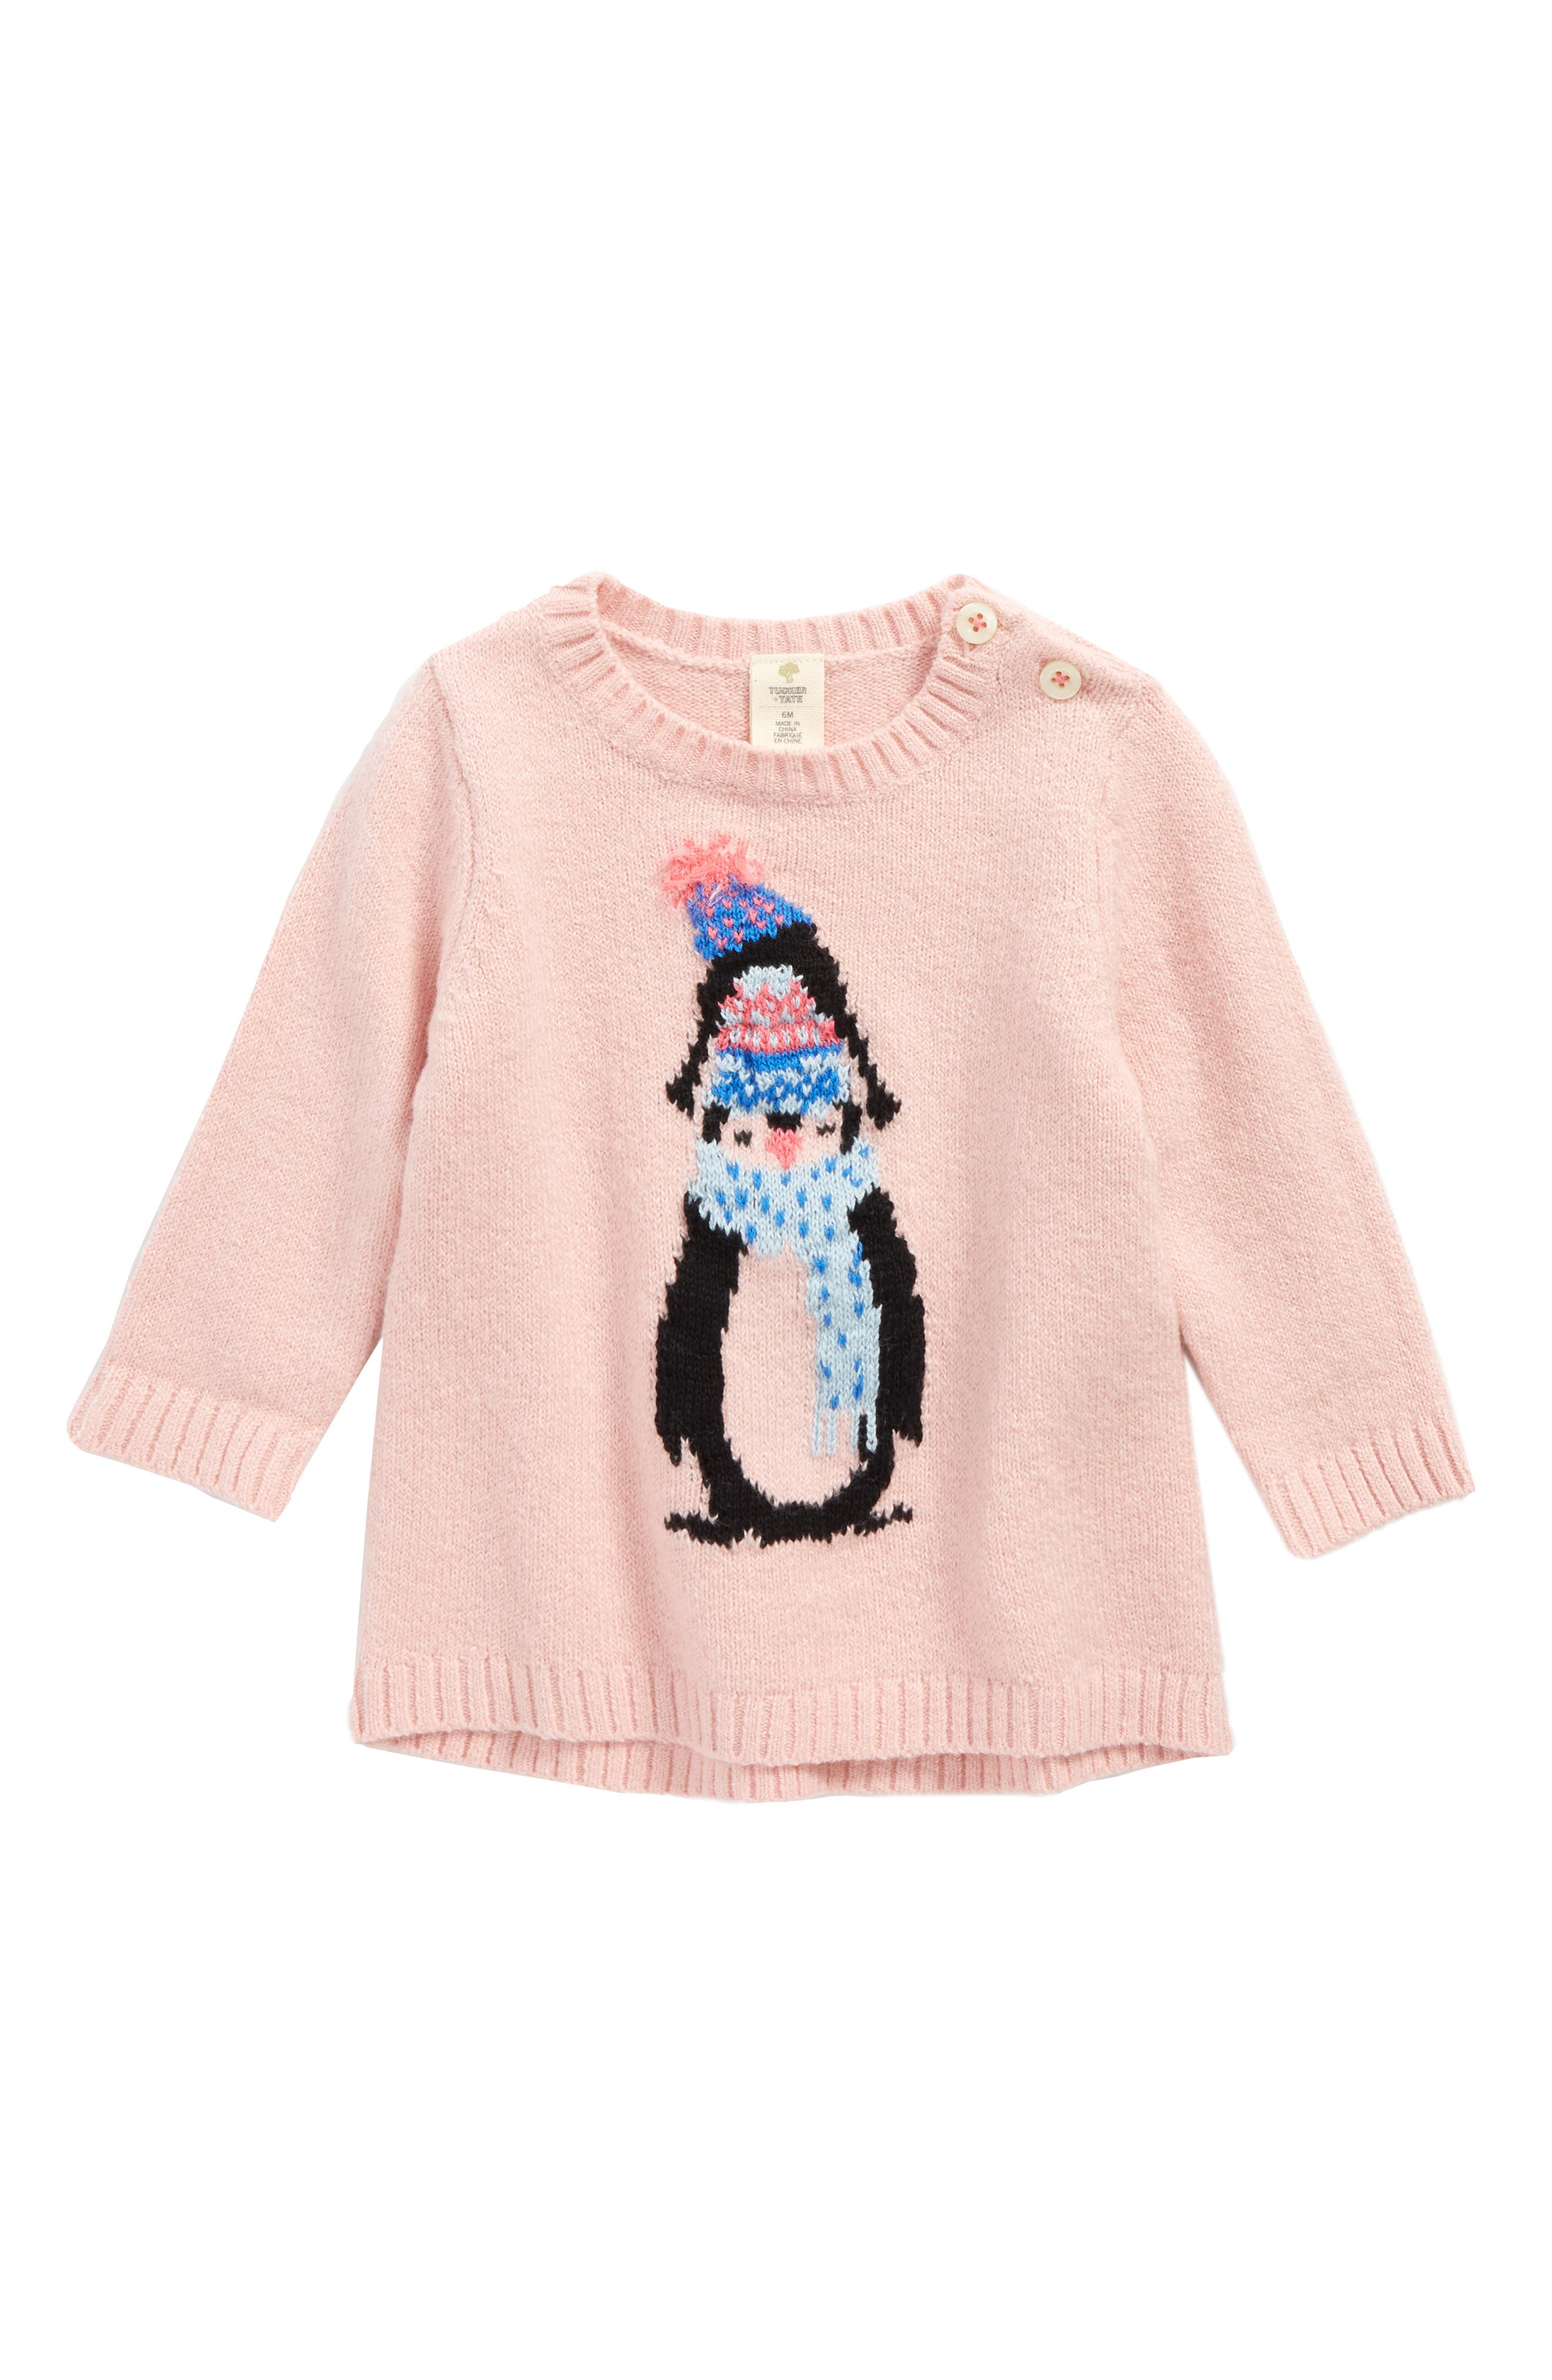 Penguin Sweater,                             Main thumbnail 1, color,                             Pink Silver Penguin